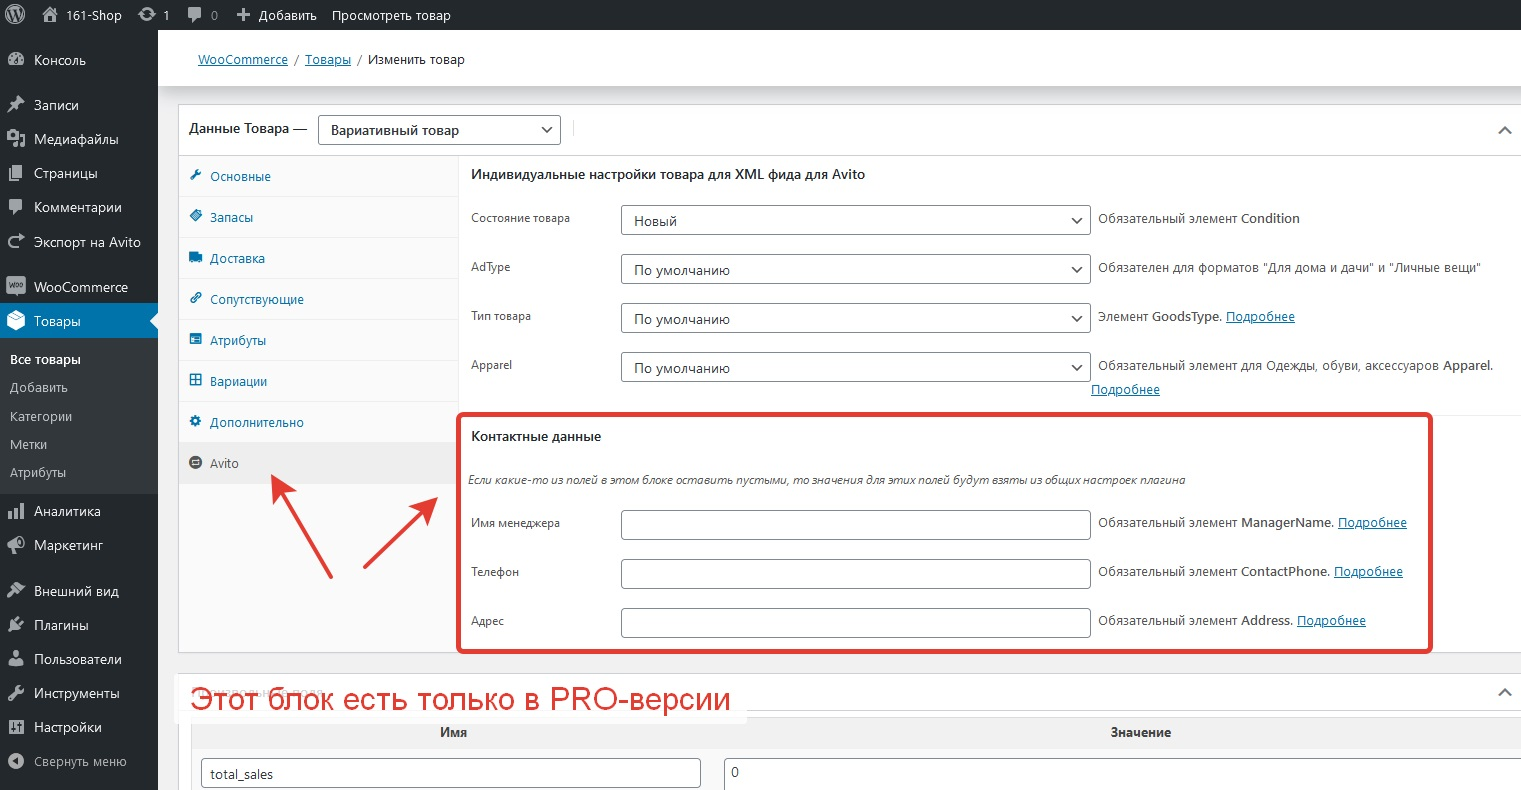 Блок настроек в XML for Avito Pro